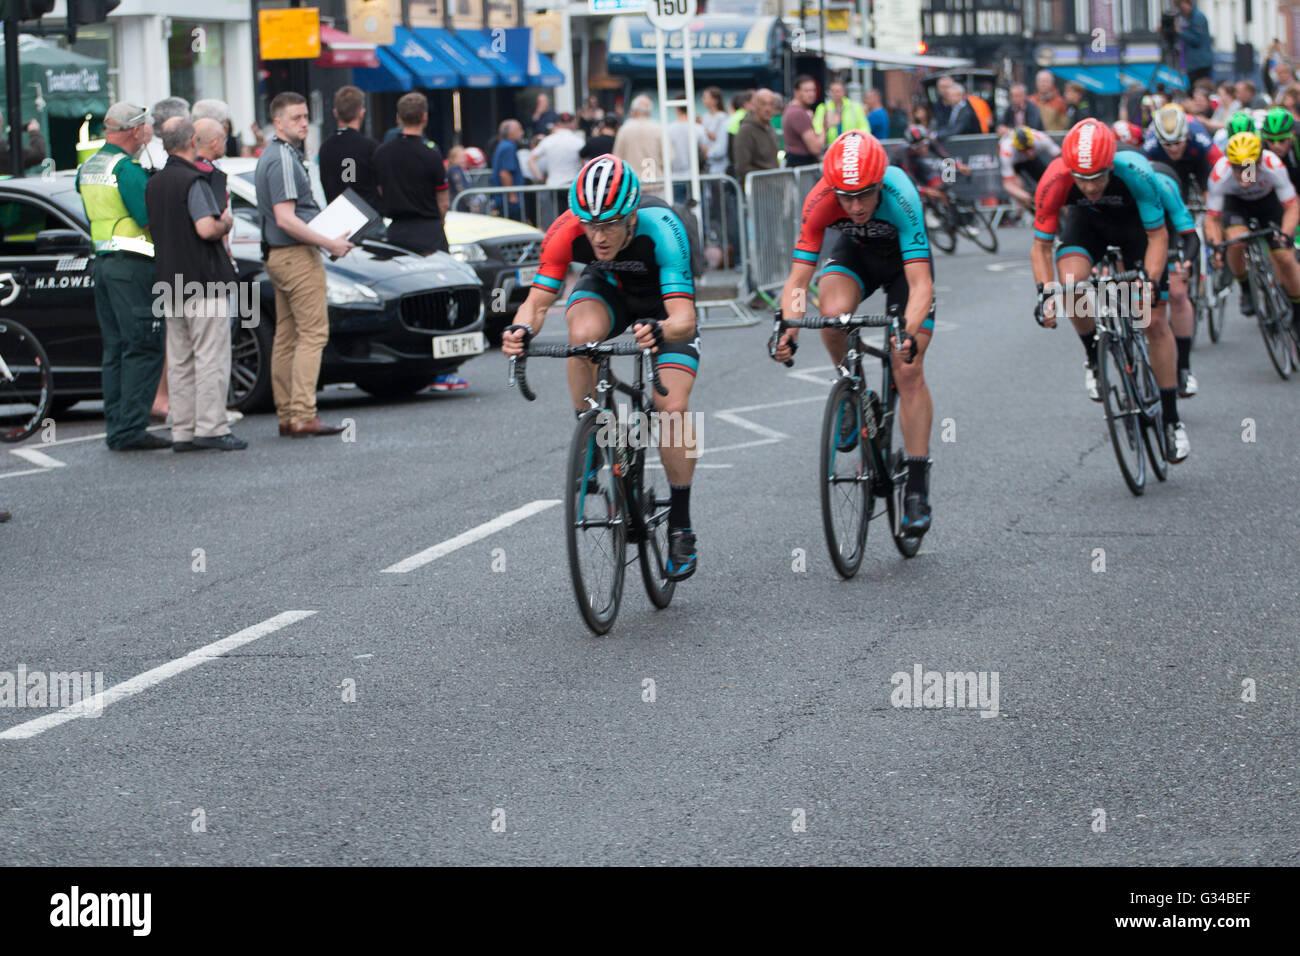 Madison Genesis Cycling Team Sieger Croydon Radrennen Radsport Pearl Izumi Tour Serie 2016 Herren Stockbild